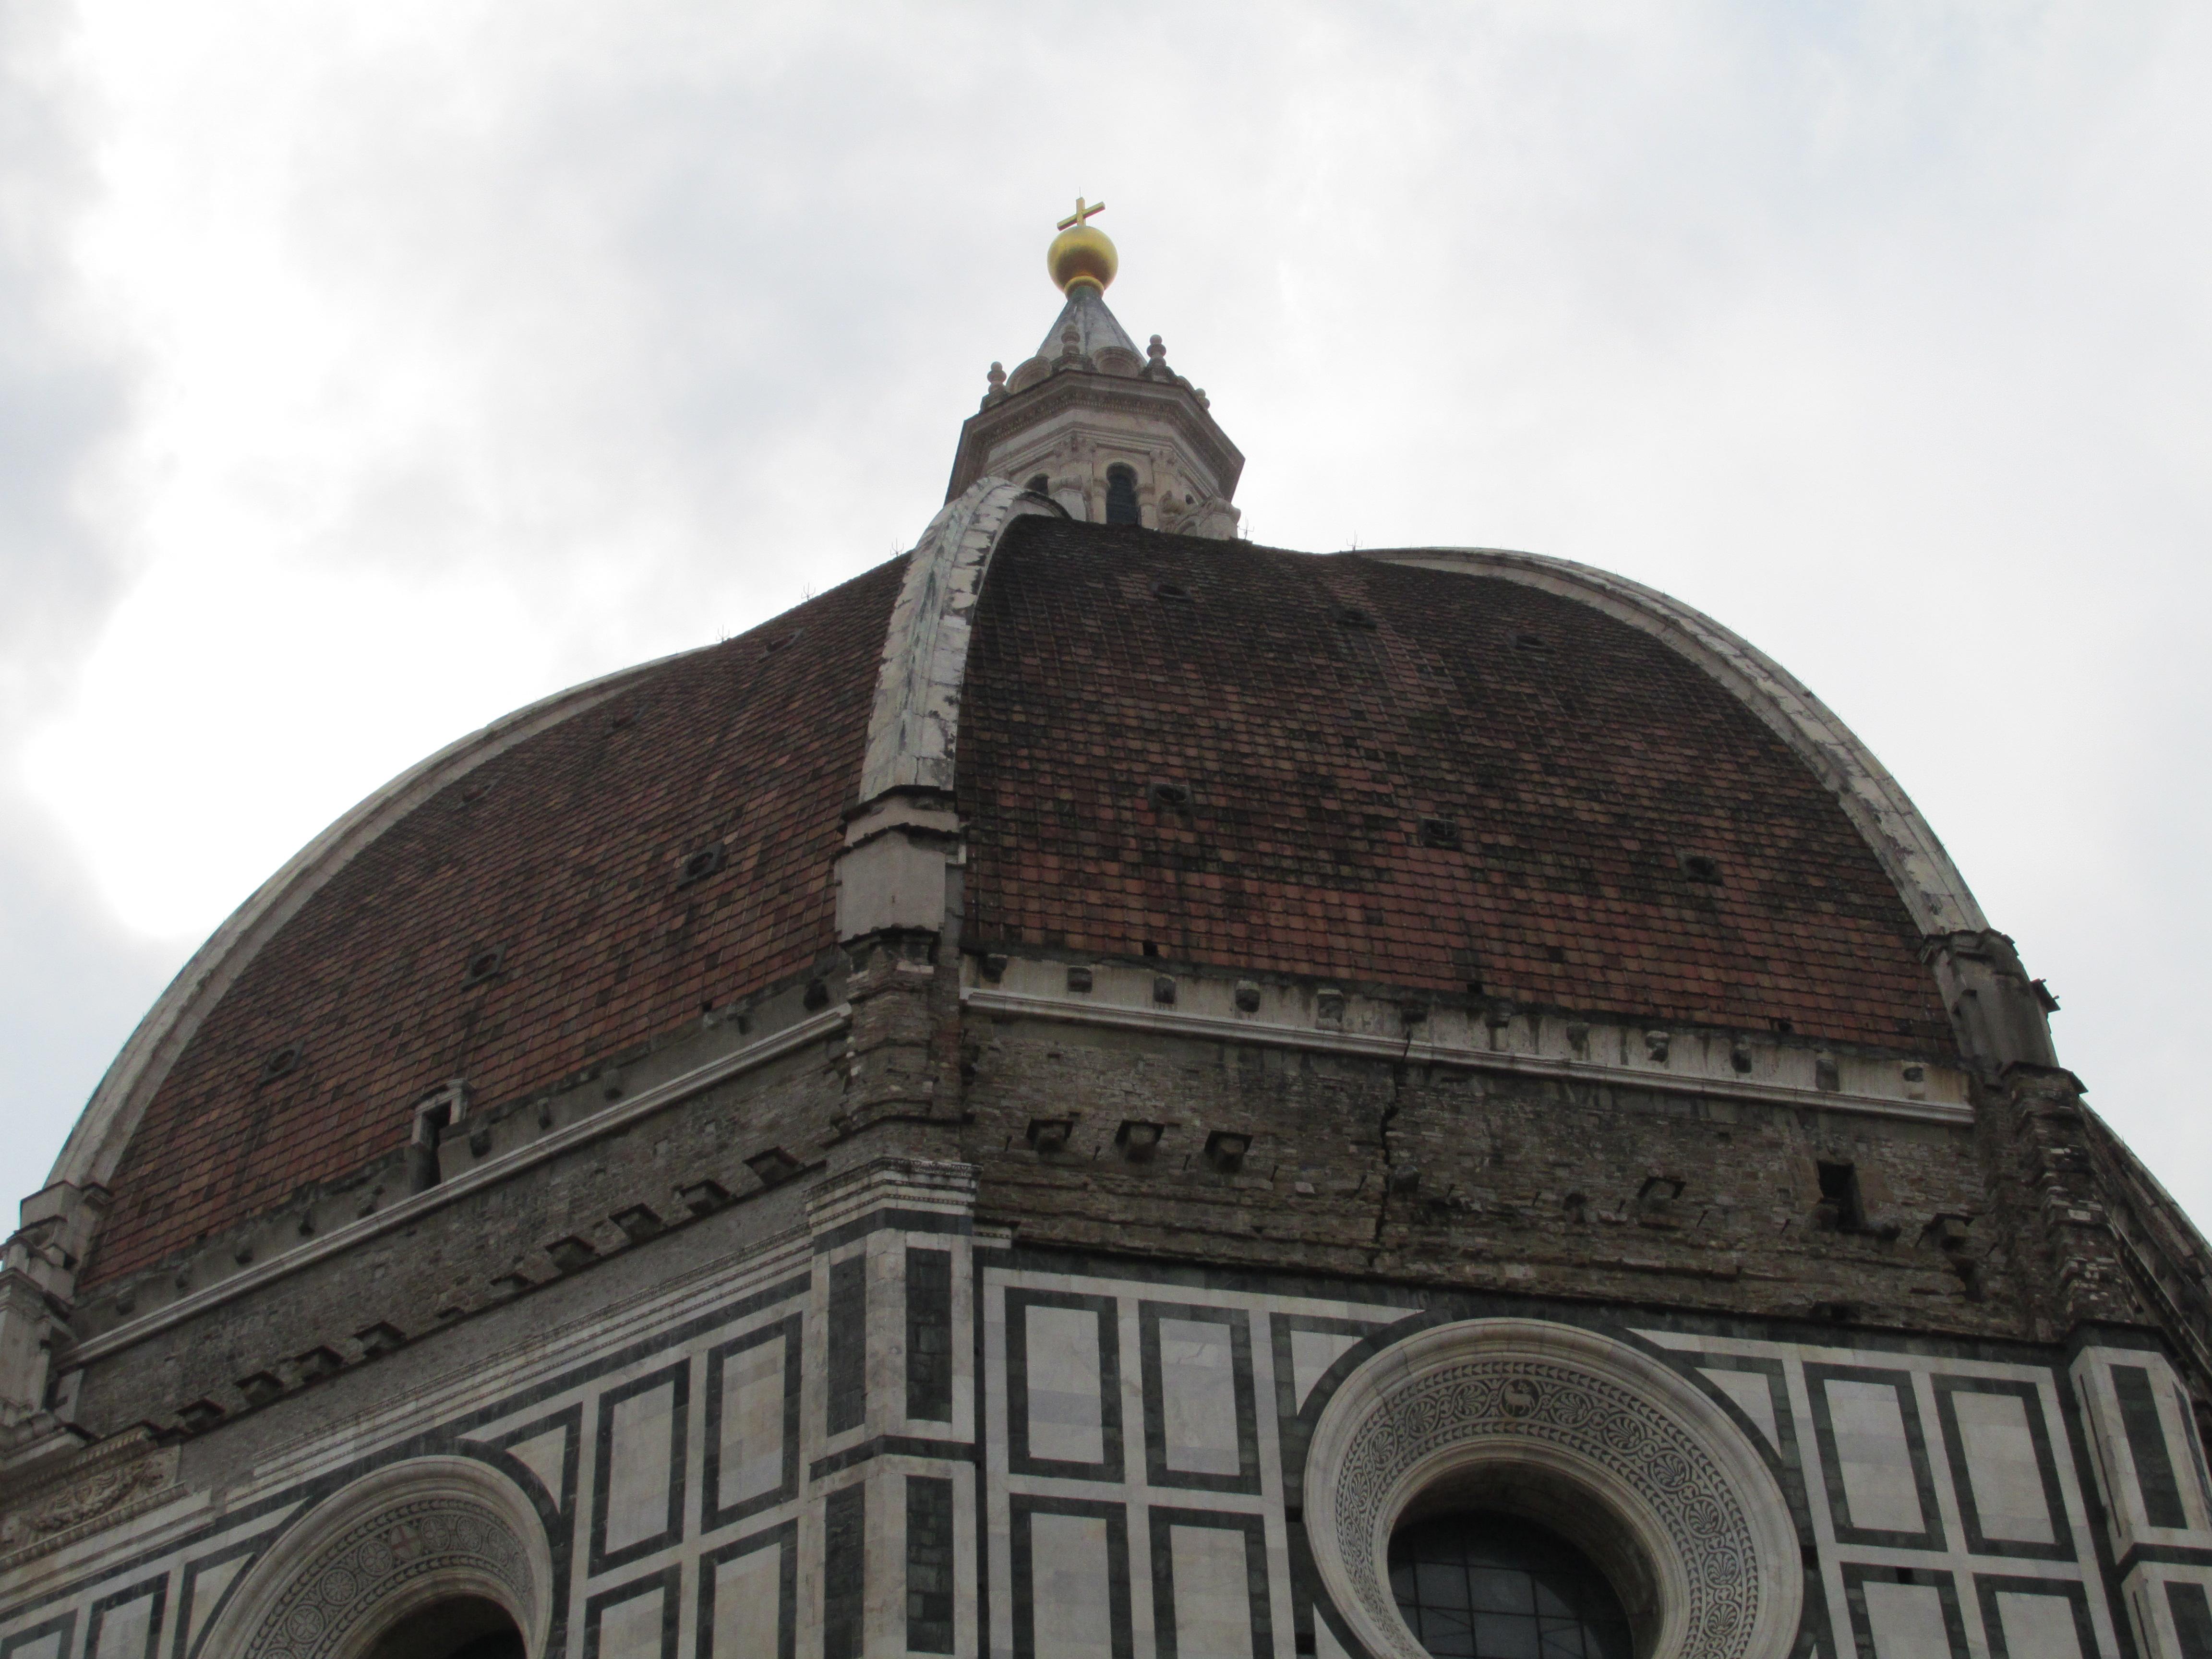 img 2843 - Visitando la Catedral Santa Maria del Fiore de Florencia I/III